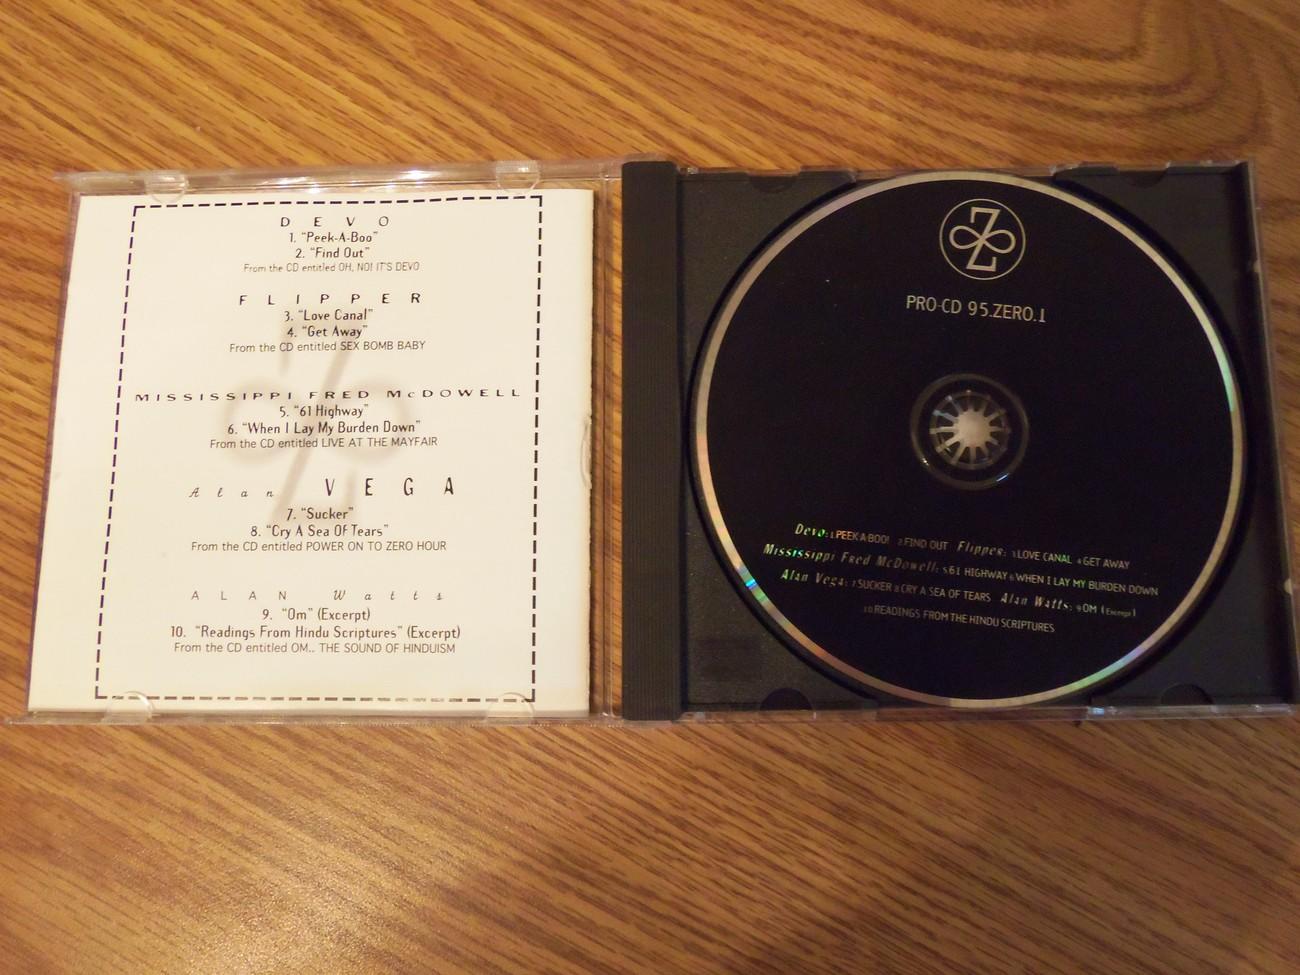 Infinite Zero Promotional Cd #2 Flipper Devo Alan Vega Alan Watts Fred McDowell